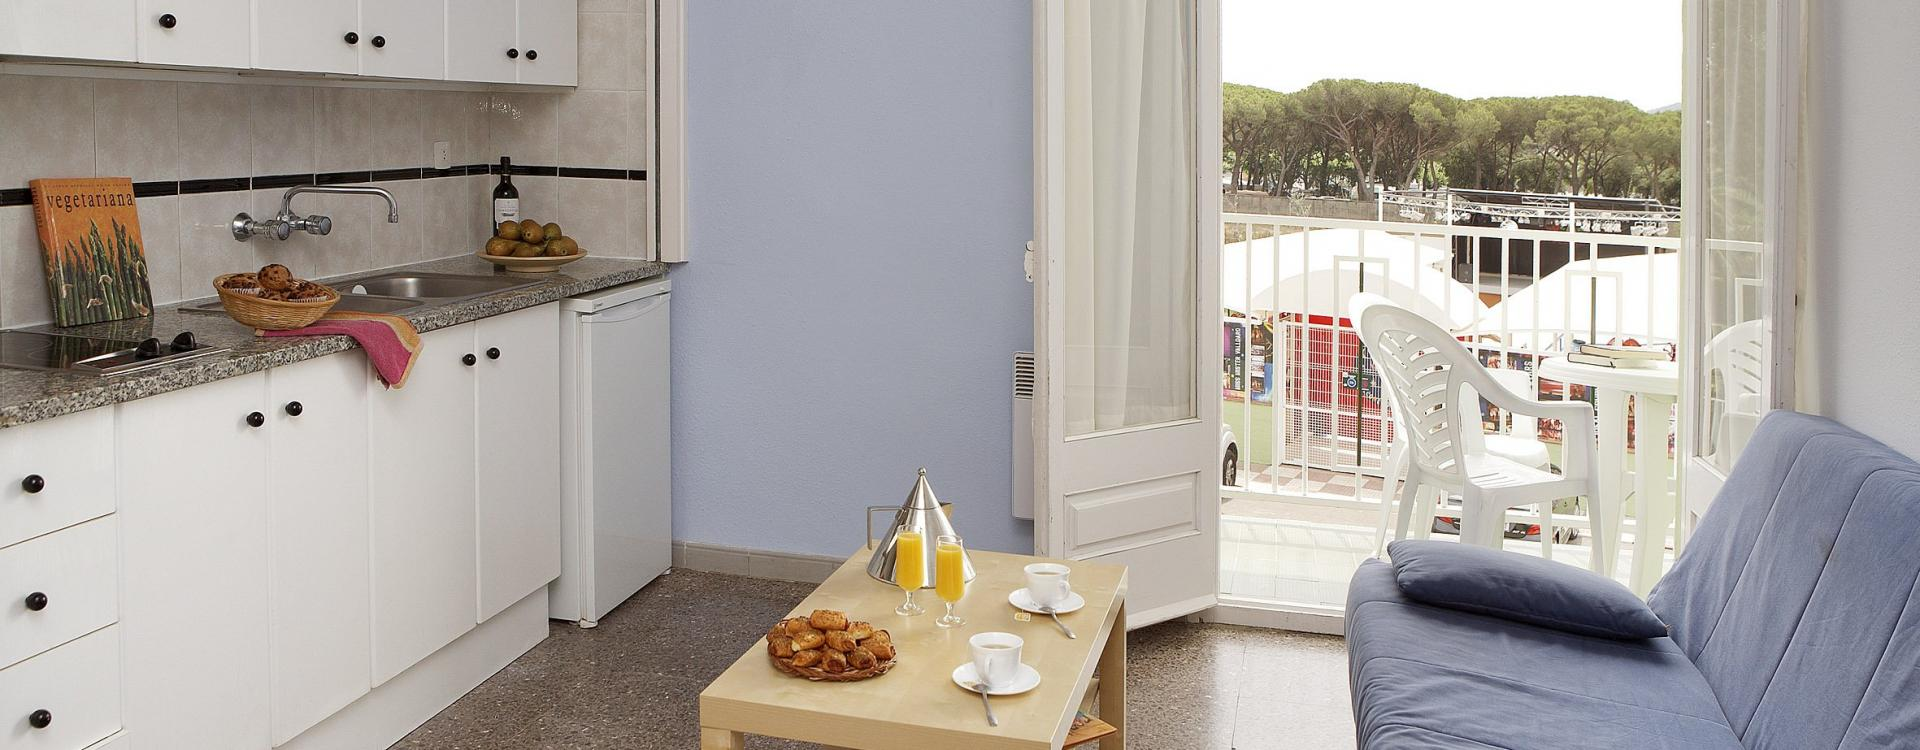 Studio cuisine avec balcon